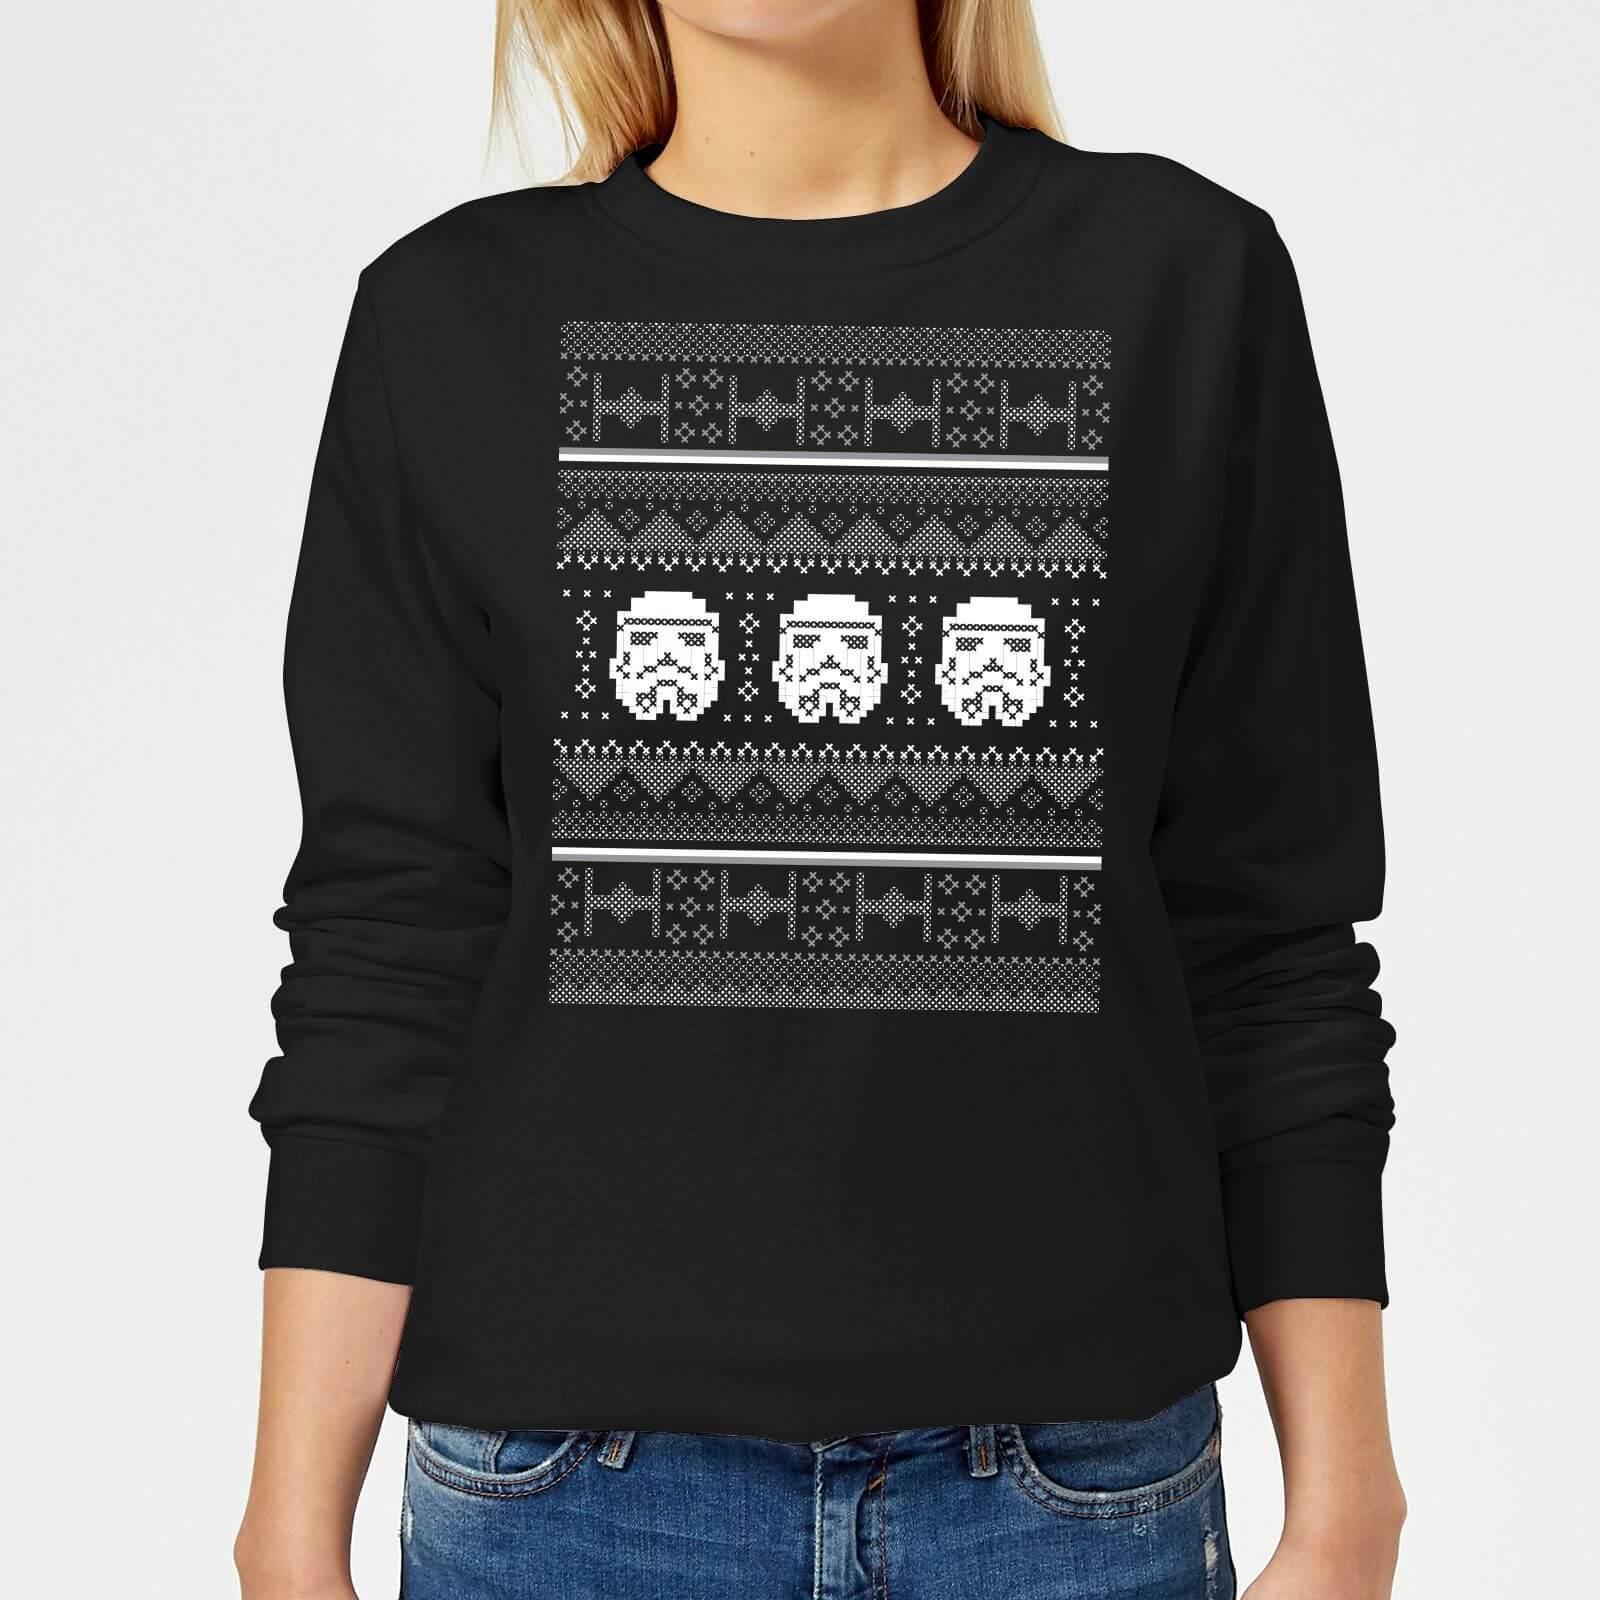 Star Wars Stormtrooper Knit Women's Christmas Sweatshirt - Black - XL - Schwarz